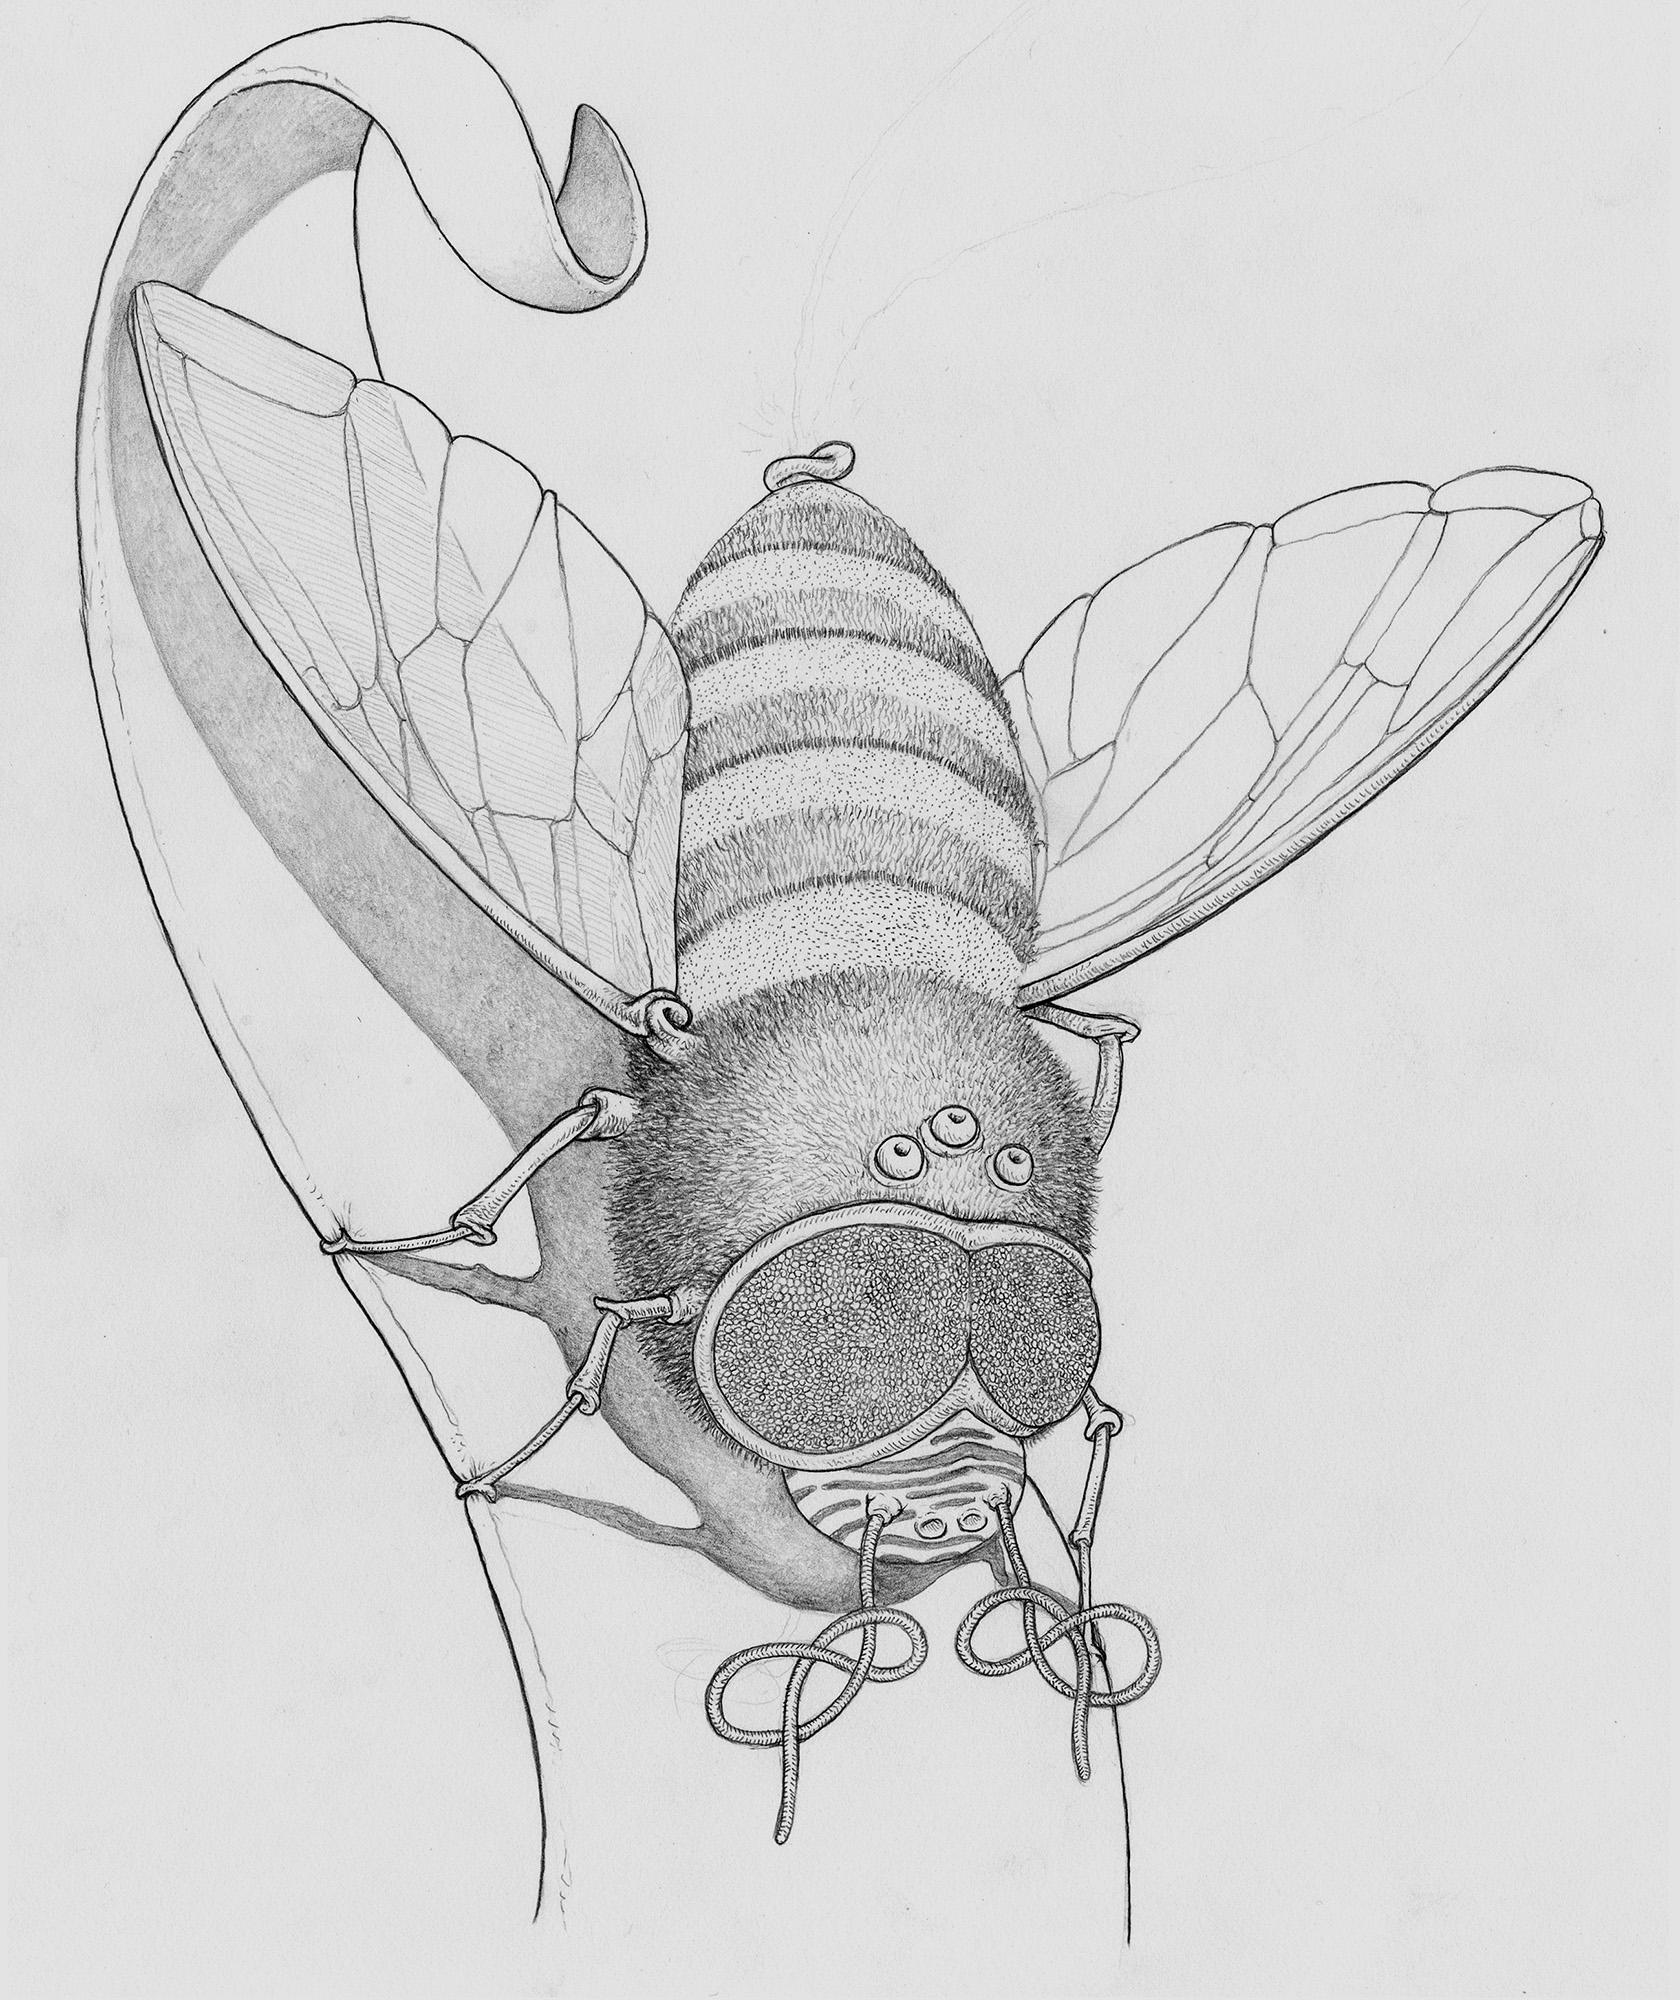 shaved-bee-3-graphite-web.jpg